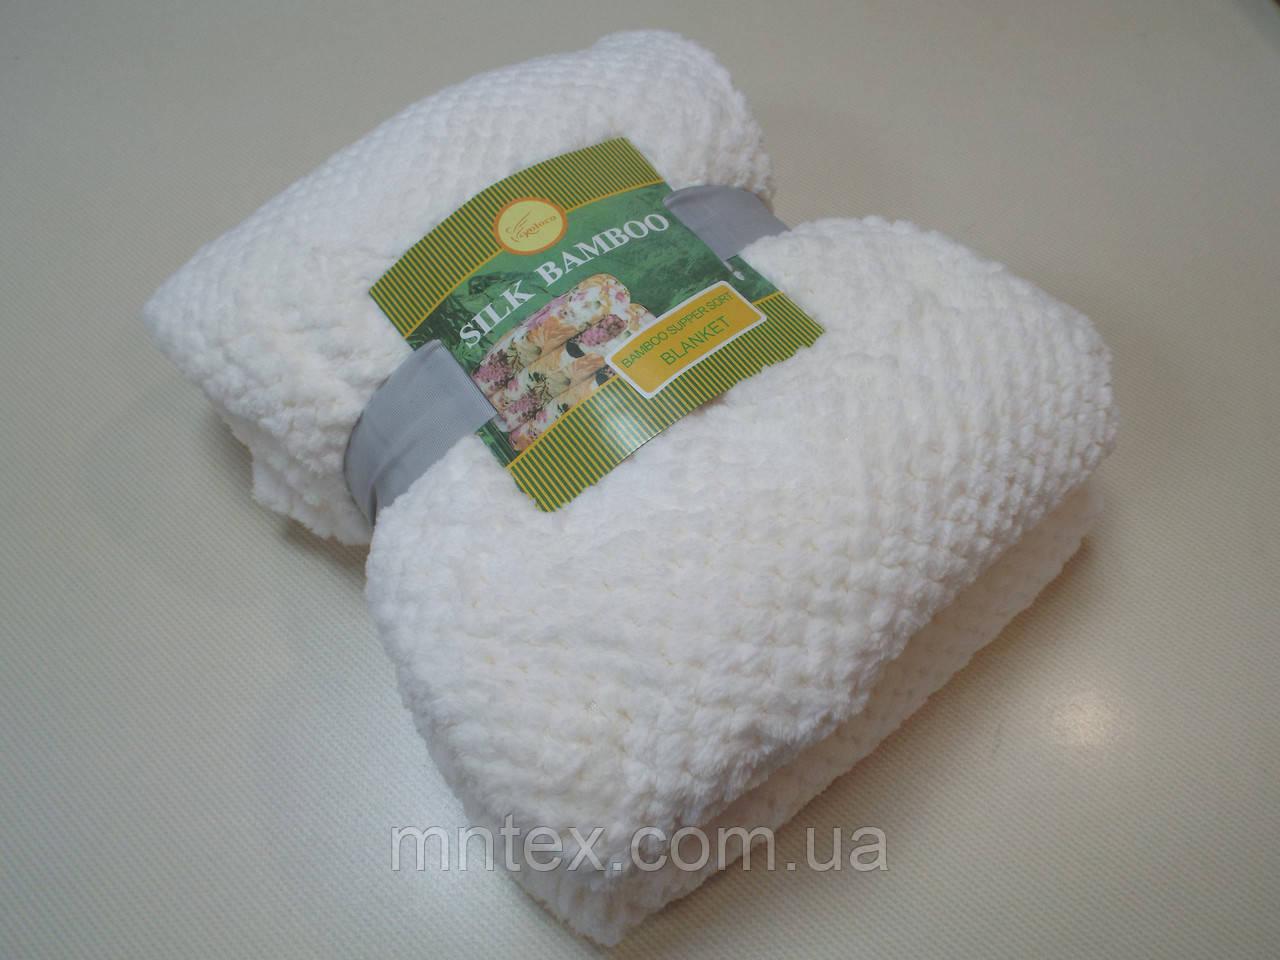 Плед бамбук-микрофибра, молочный